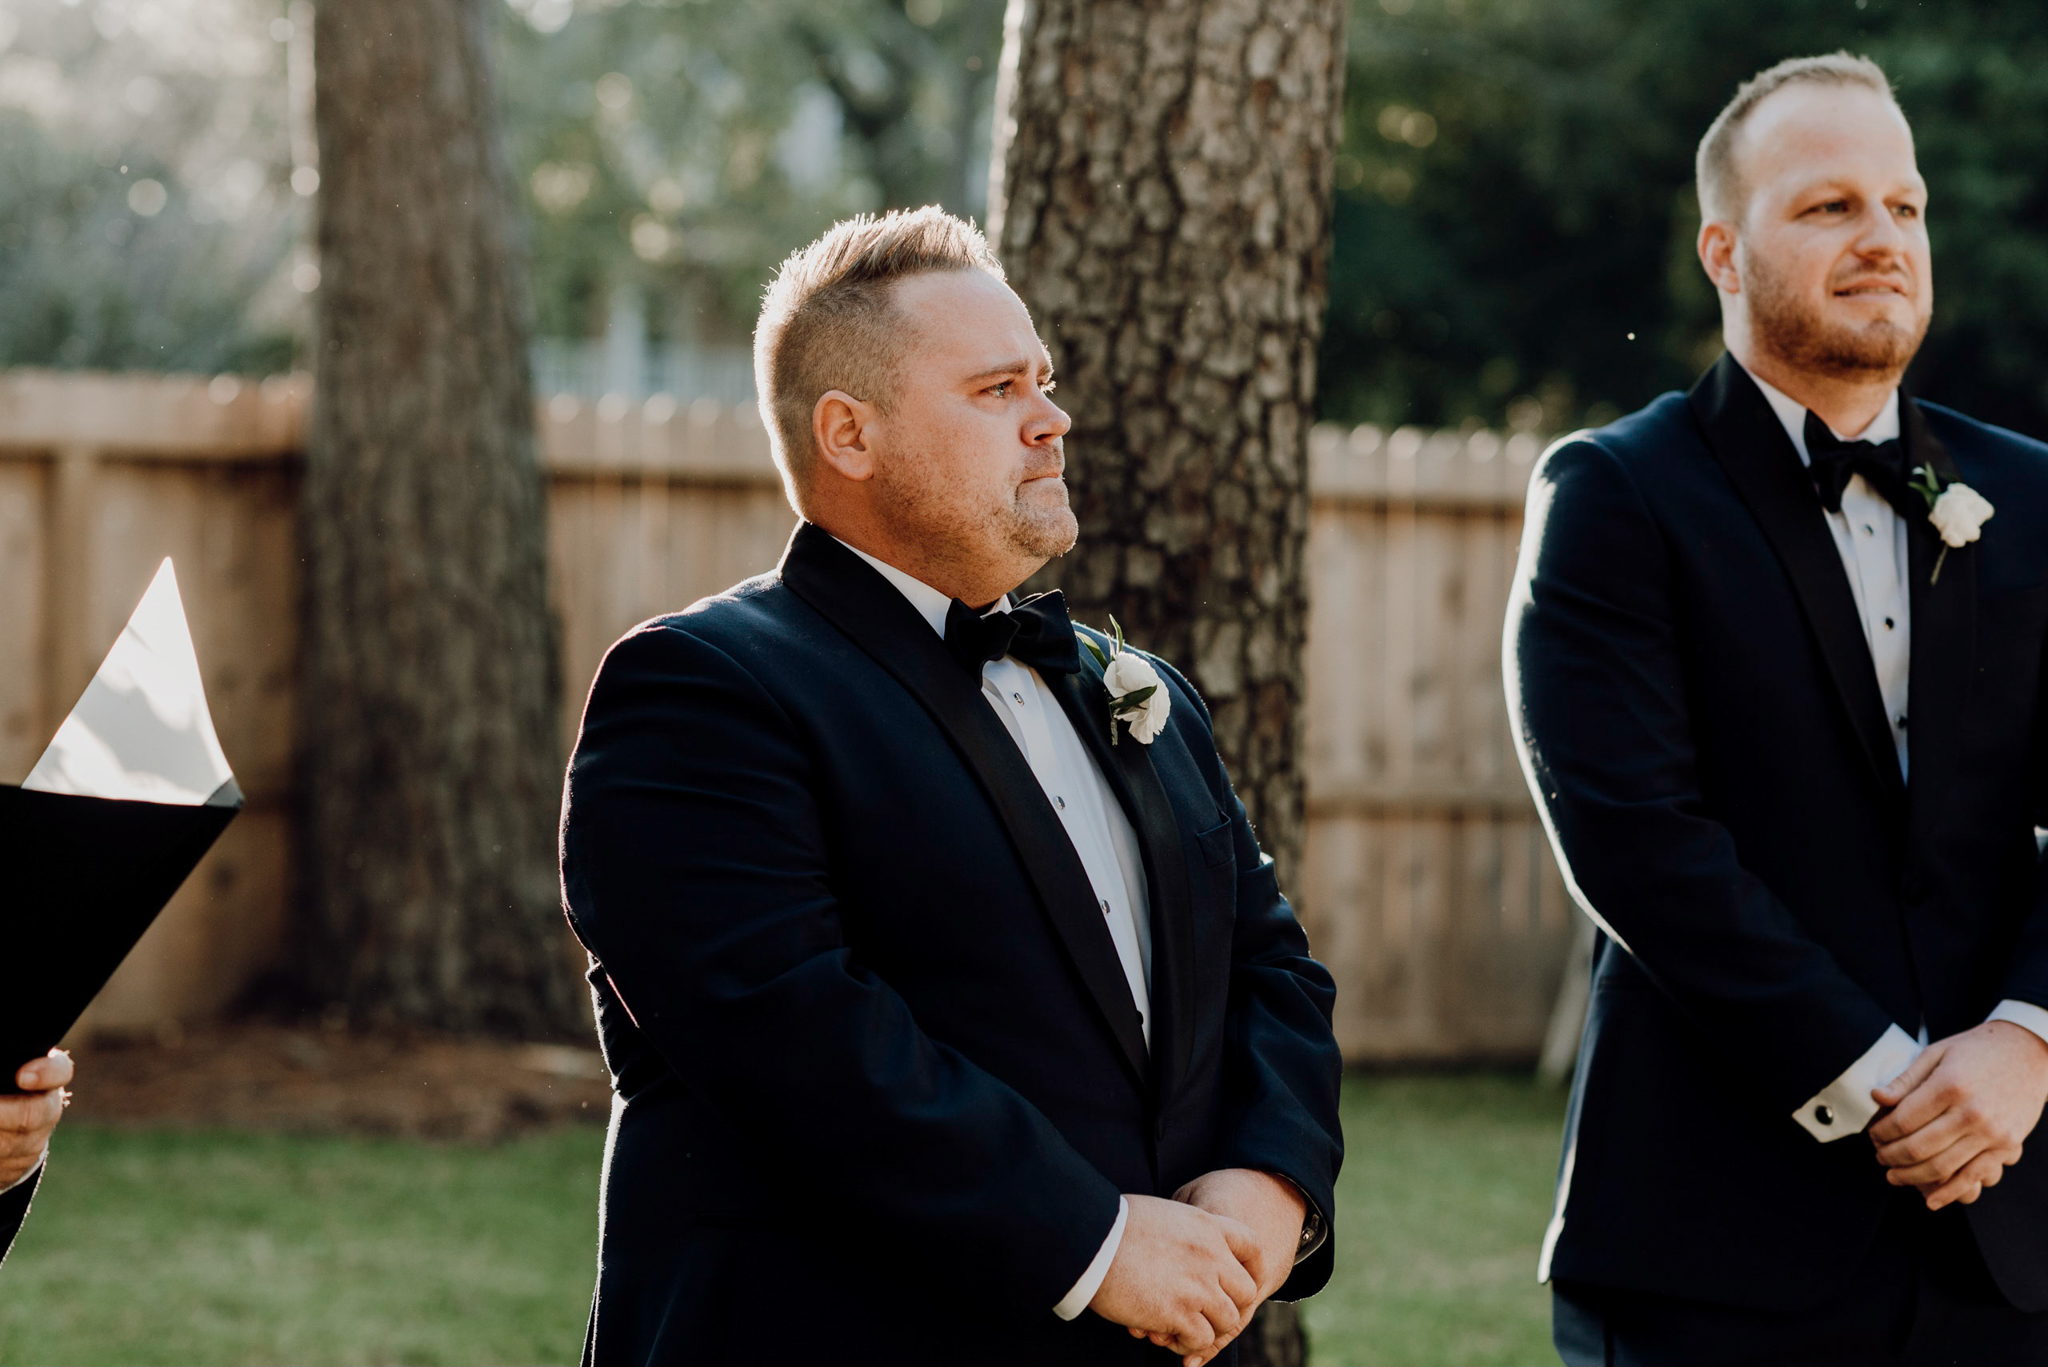 Houston Wedding Photographer-Intimate Texas Backyard Wedding- Houston Wedding Photographer -Kristen Giles Photography-37.jpg